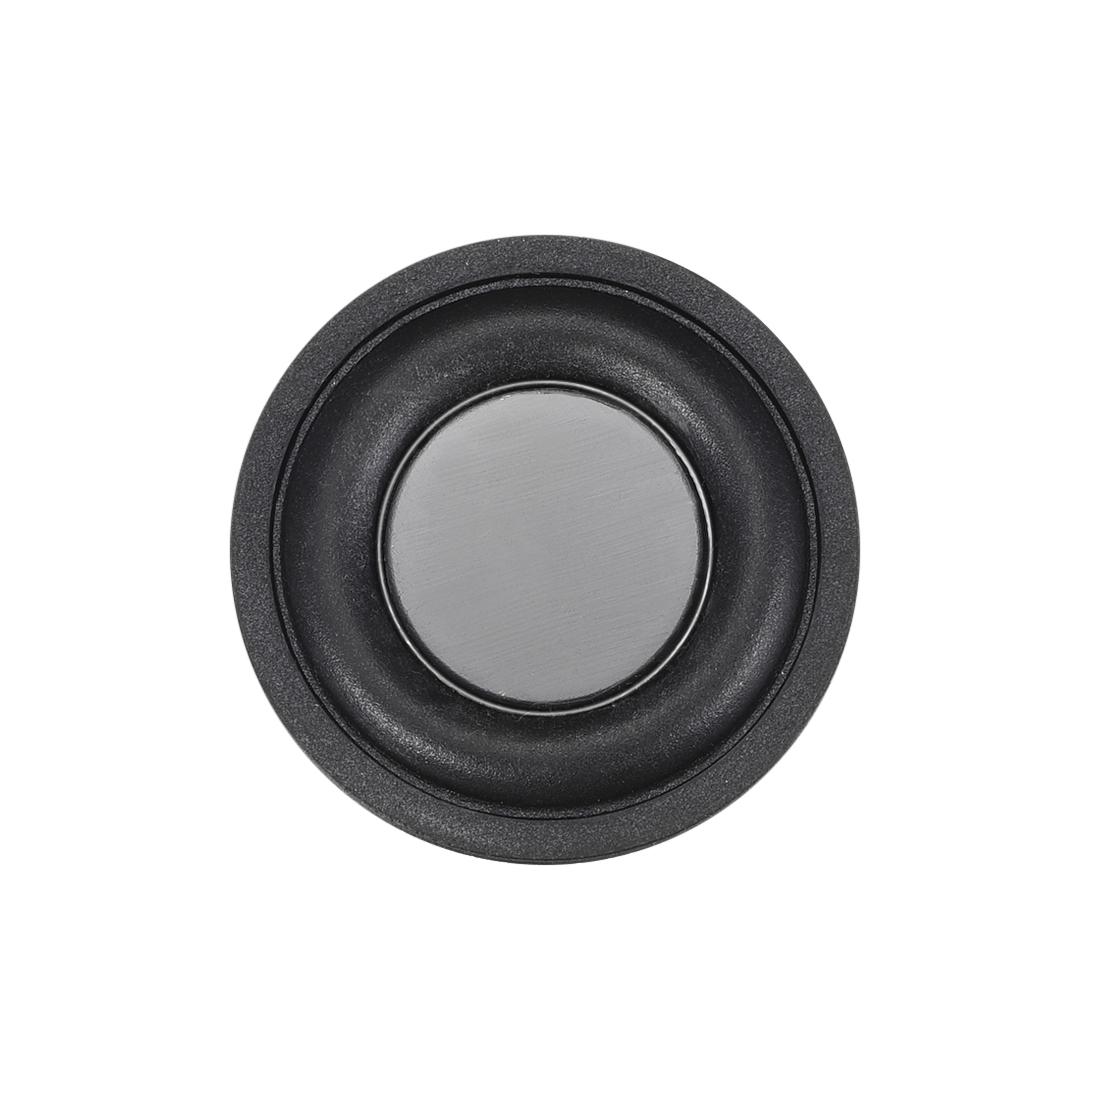 "1.4"" 36mm Bass Speaker Passive Radiator Rubber Vibration Plate DIY Repair"